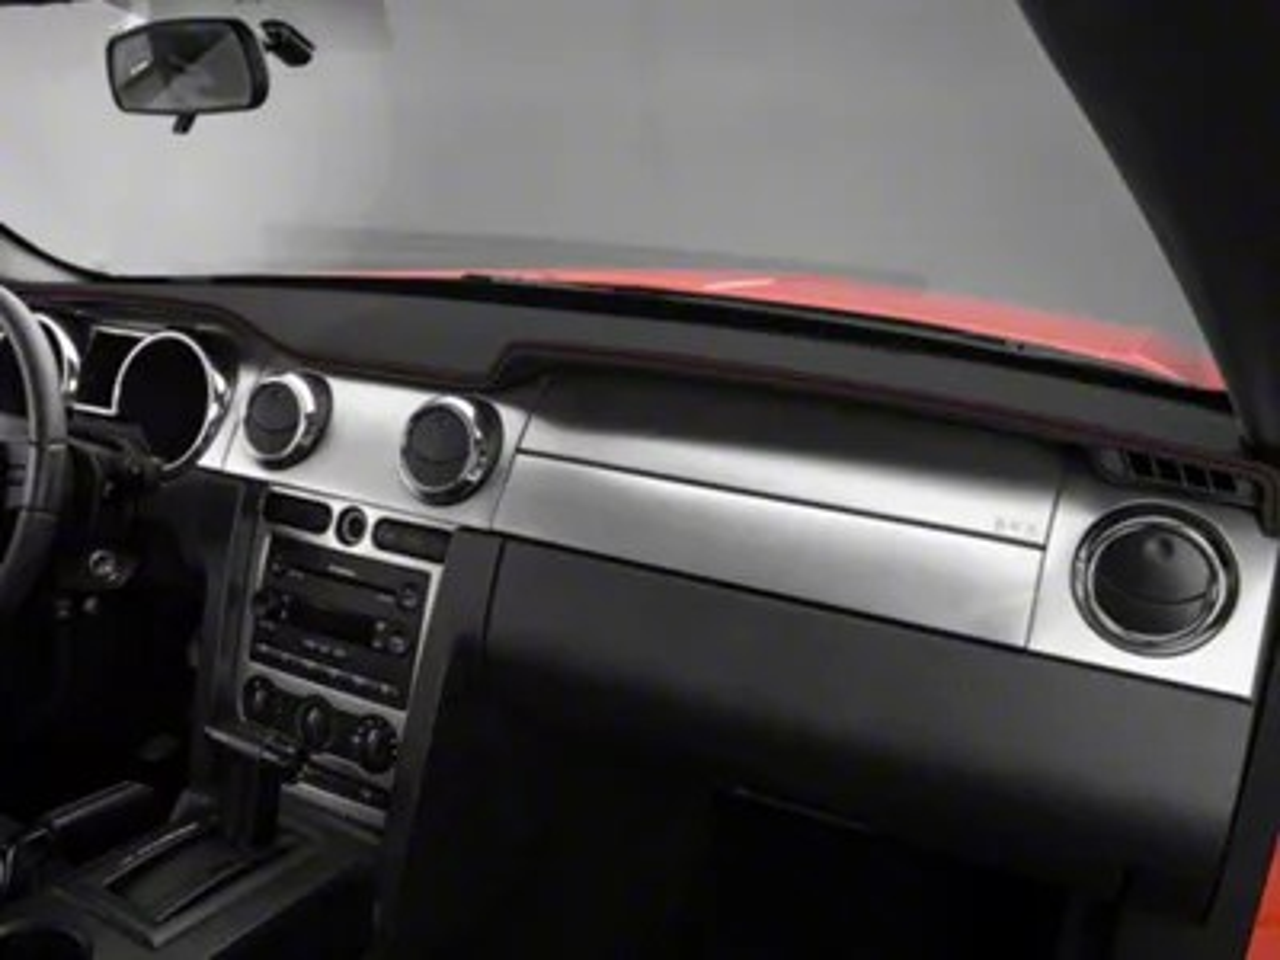 Alterum Mustang Premium Black Leather Dash Cover  Red Stitch 102216 (0509 All)